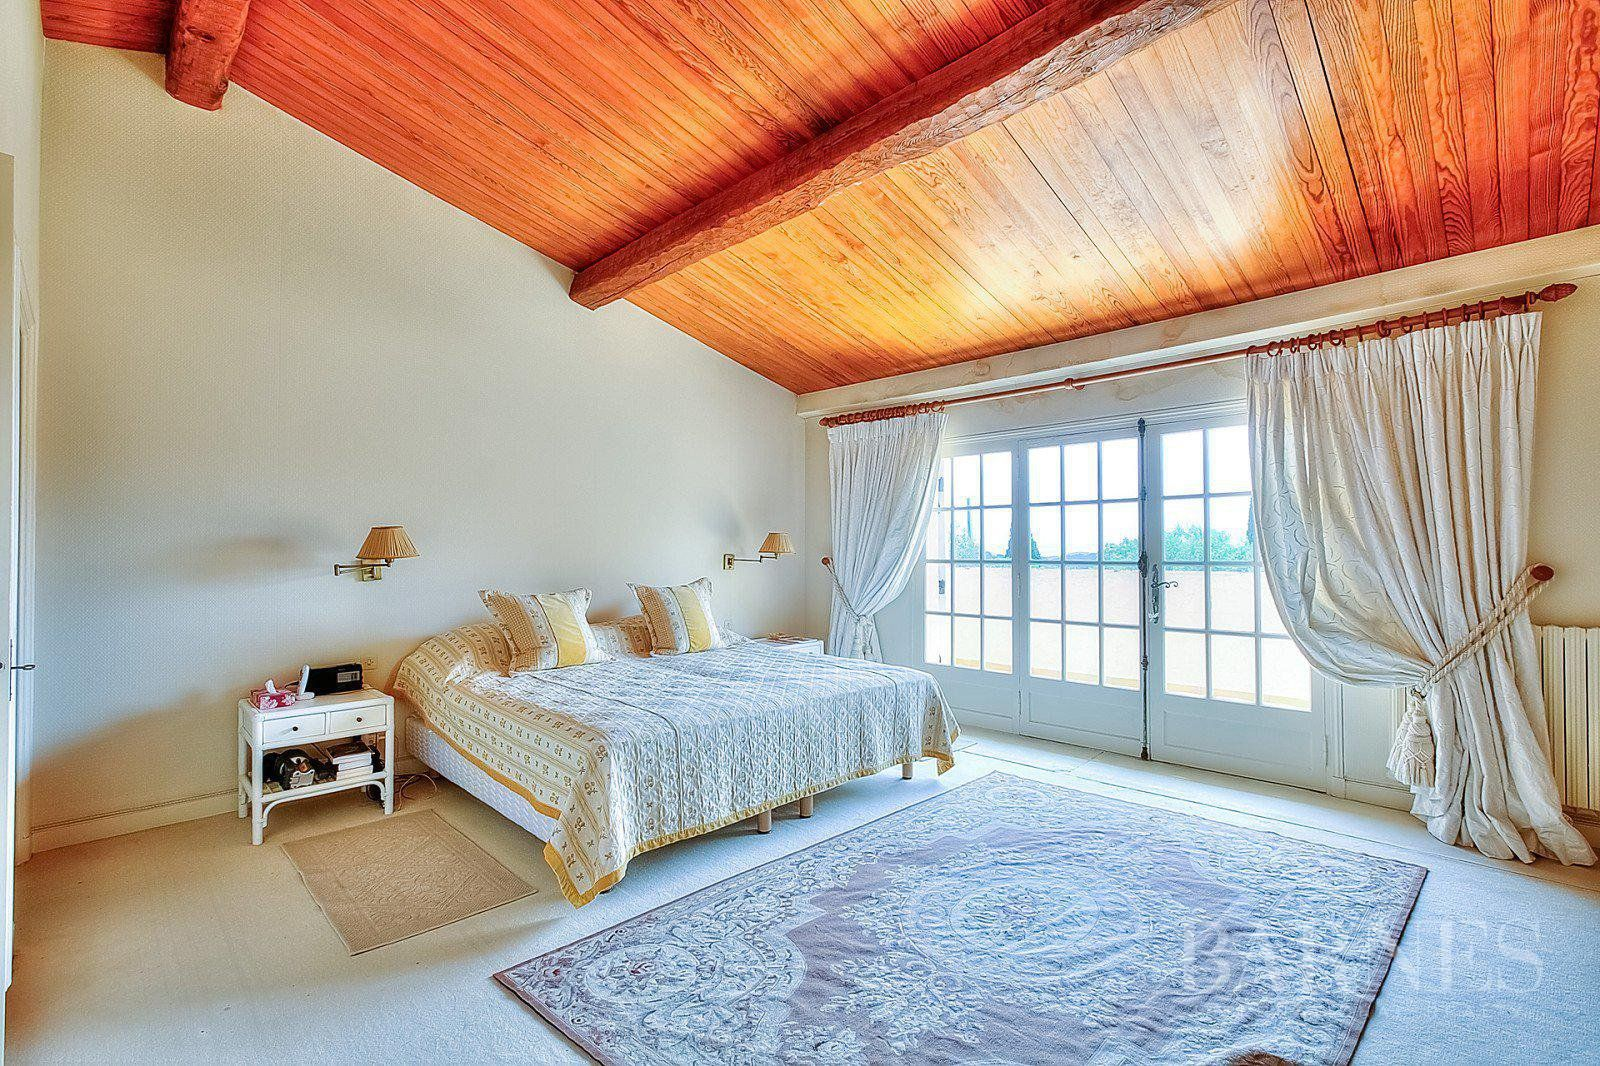 MOUANS SARTOUX - SPLENDID STONE MAS - 8 BEDROOMS - POOL - LARGE GARDENS